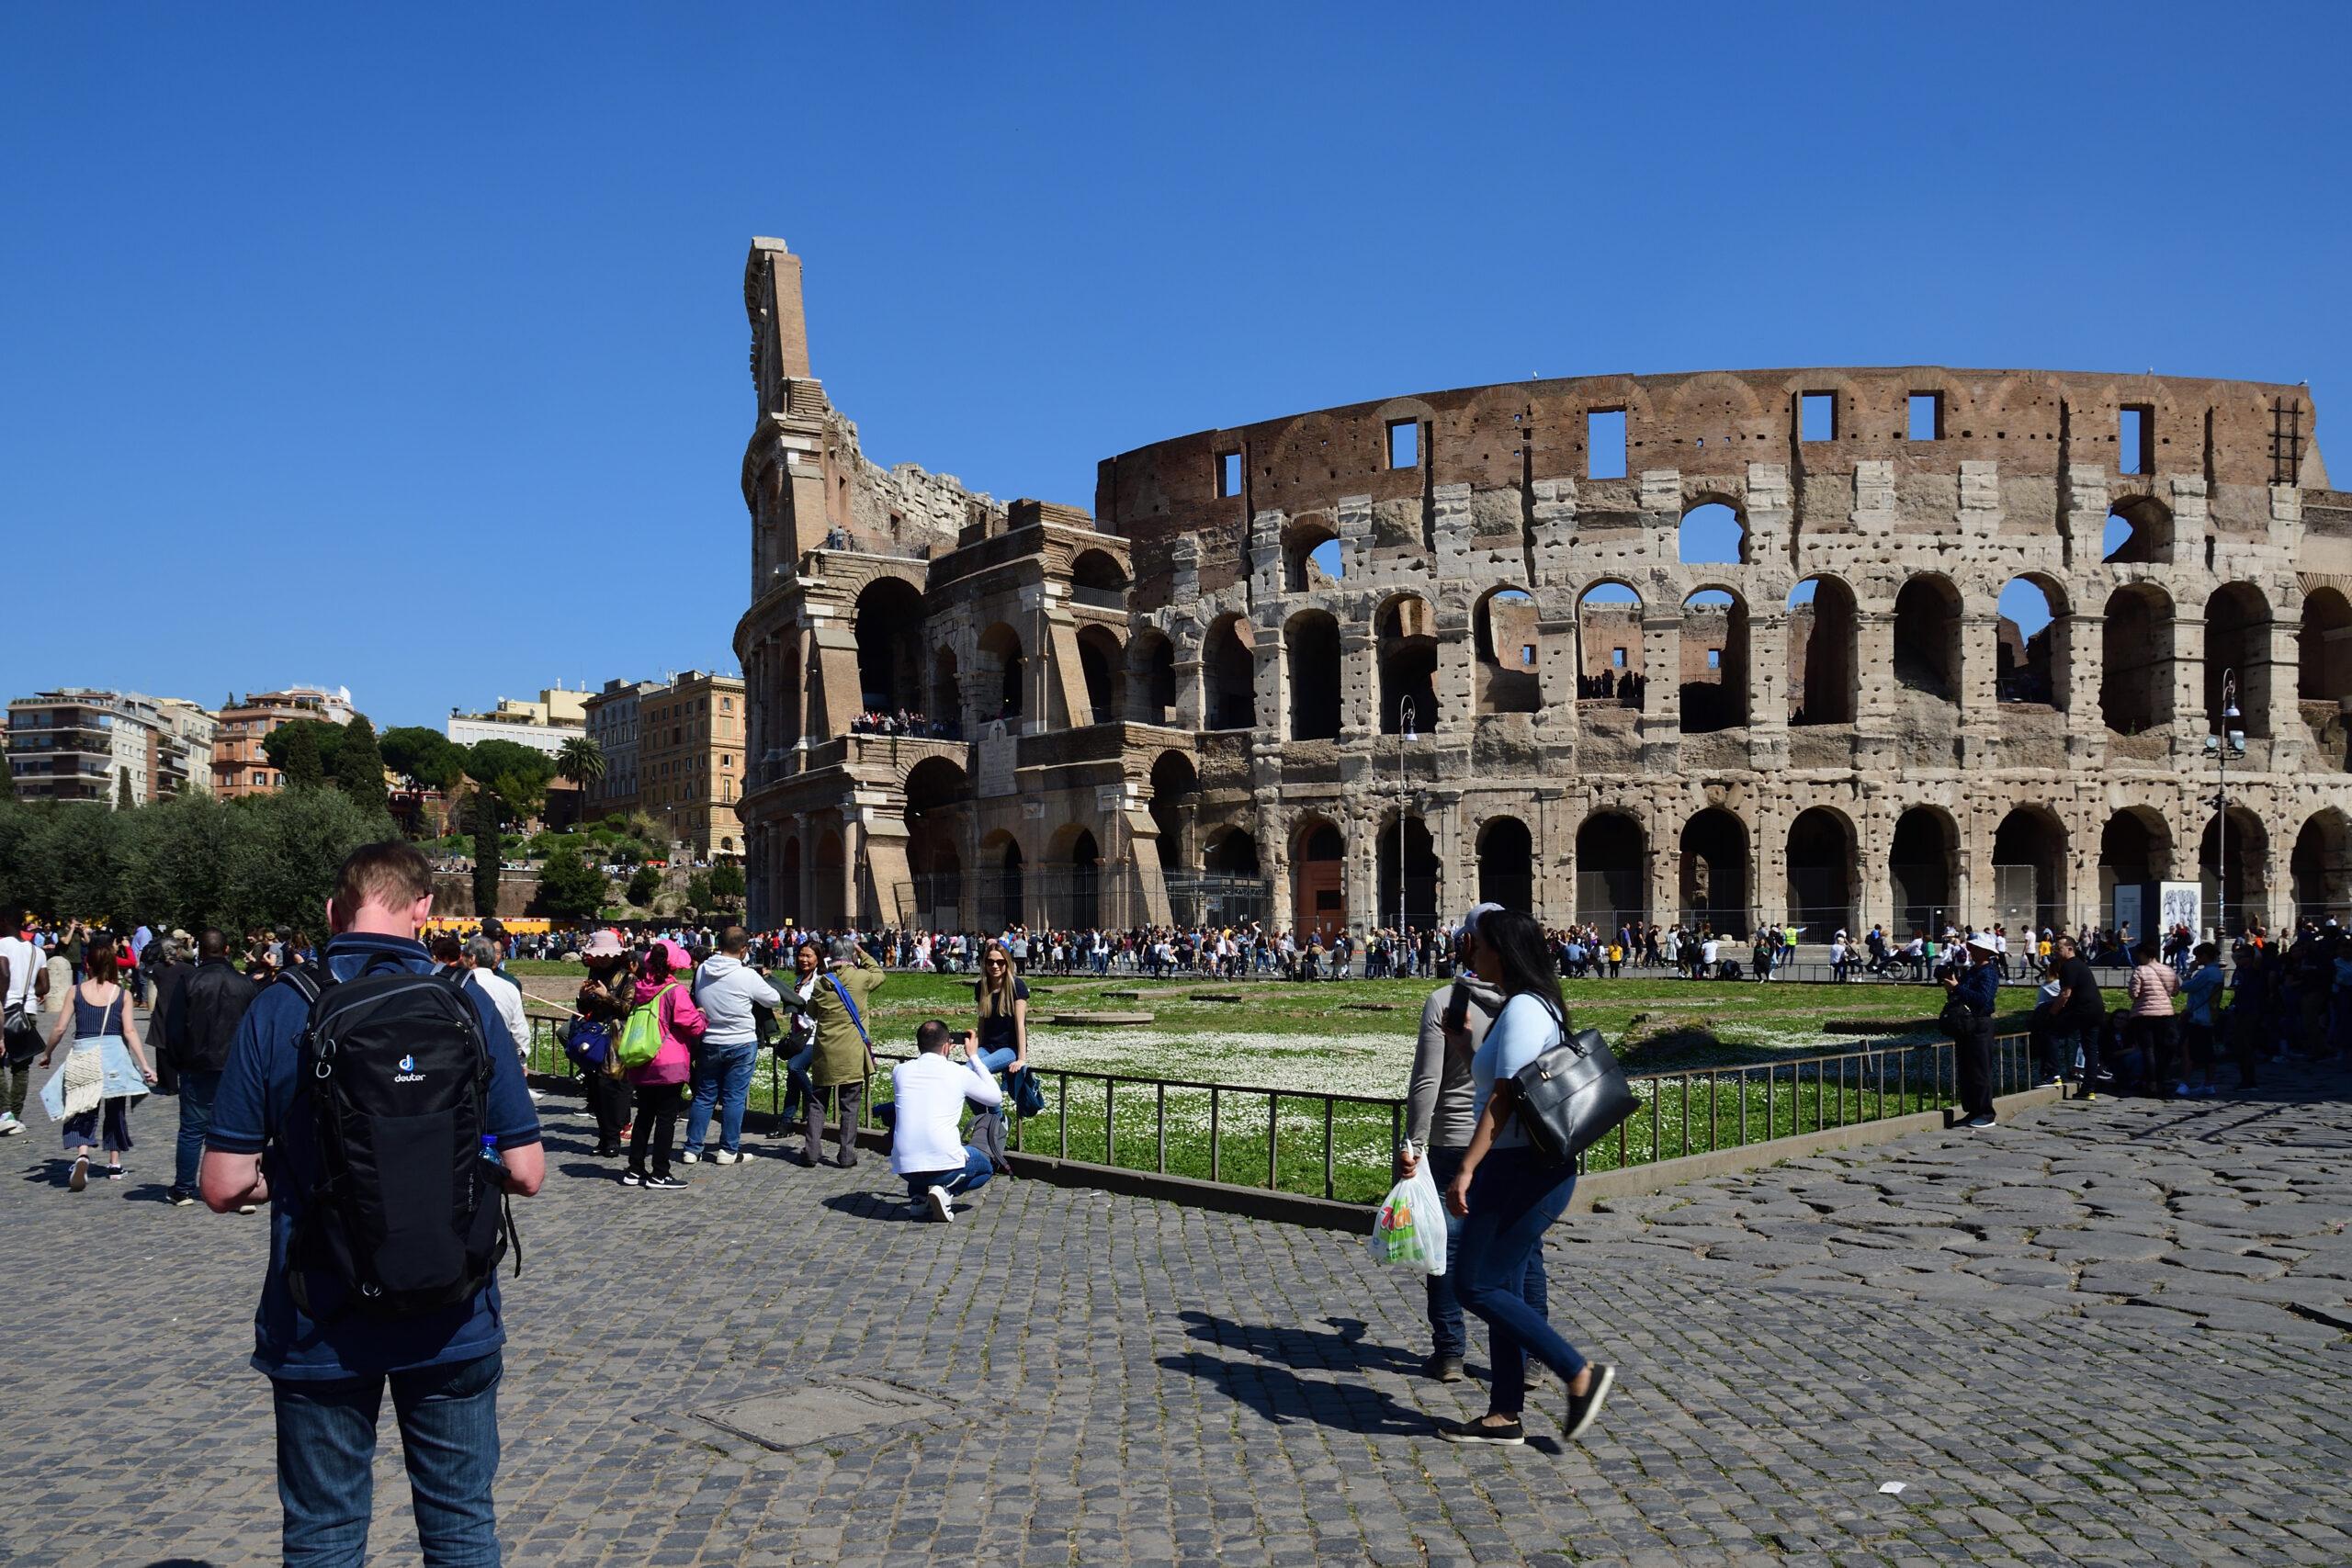 Selfiesticks at Colosseum Rome